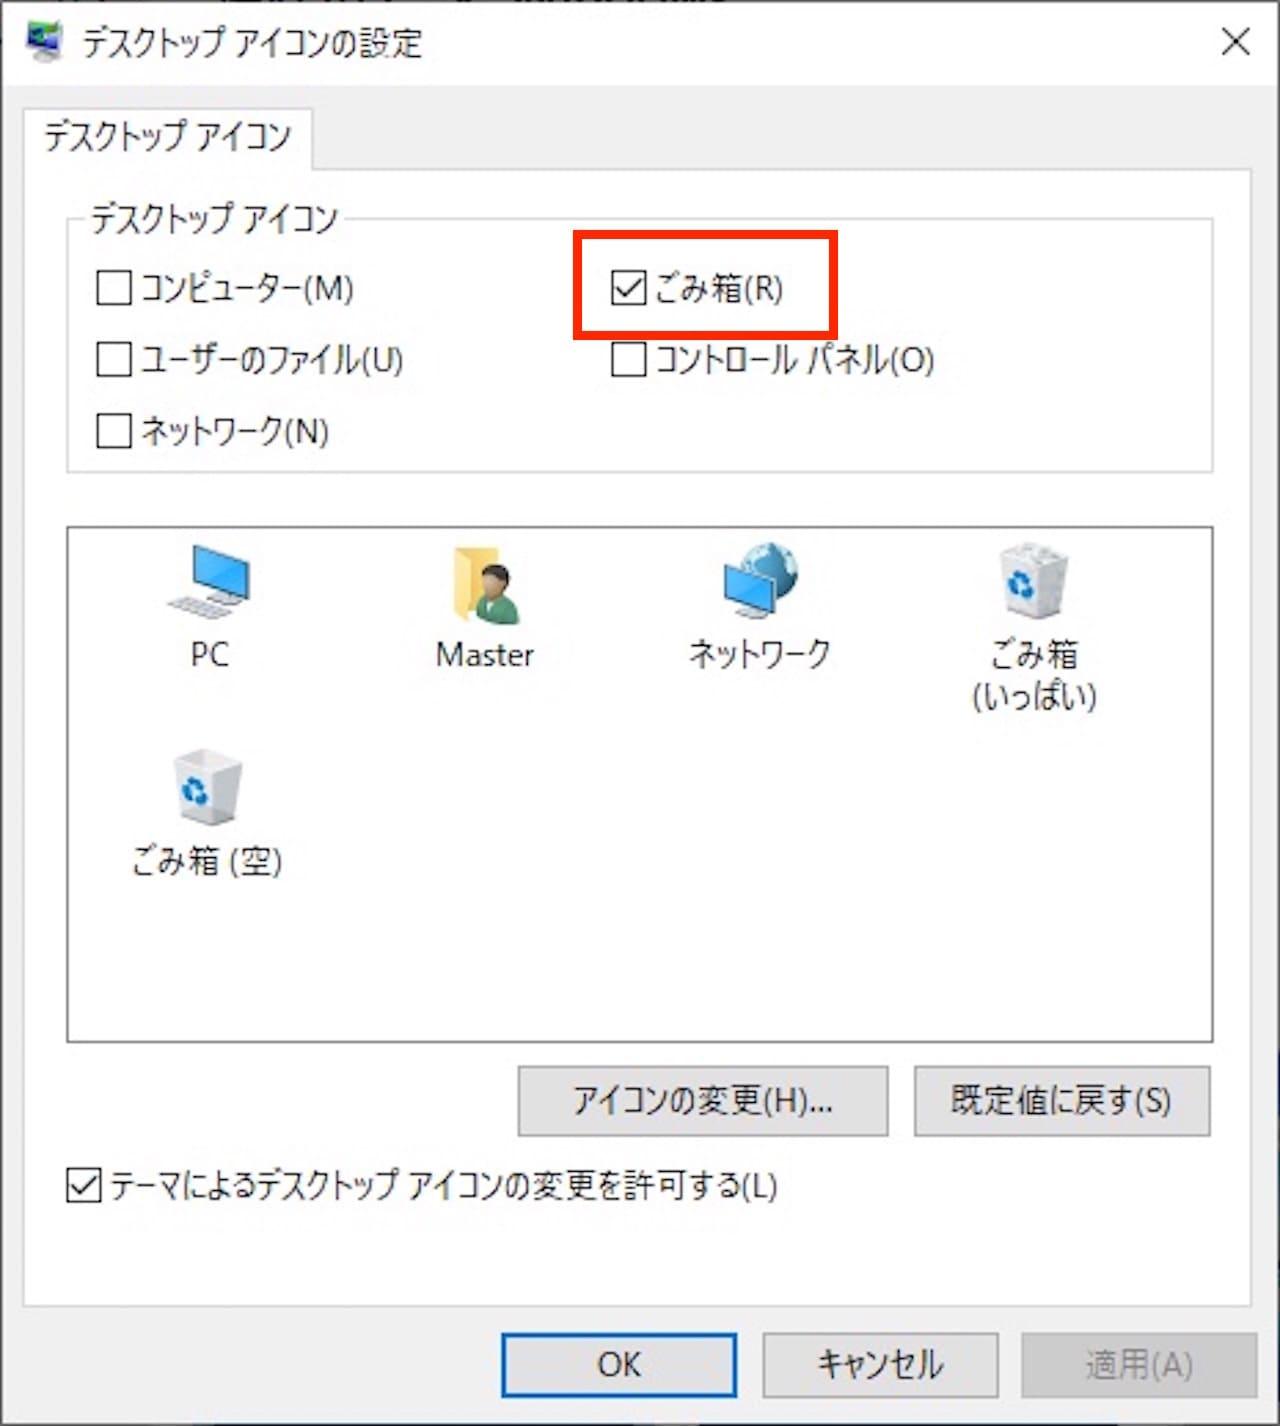 Windows10でデスクトップ上のゴミ箱アイコンの表示・非表示を切り替える方法⑥